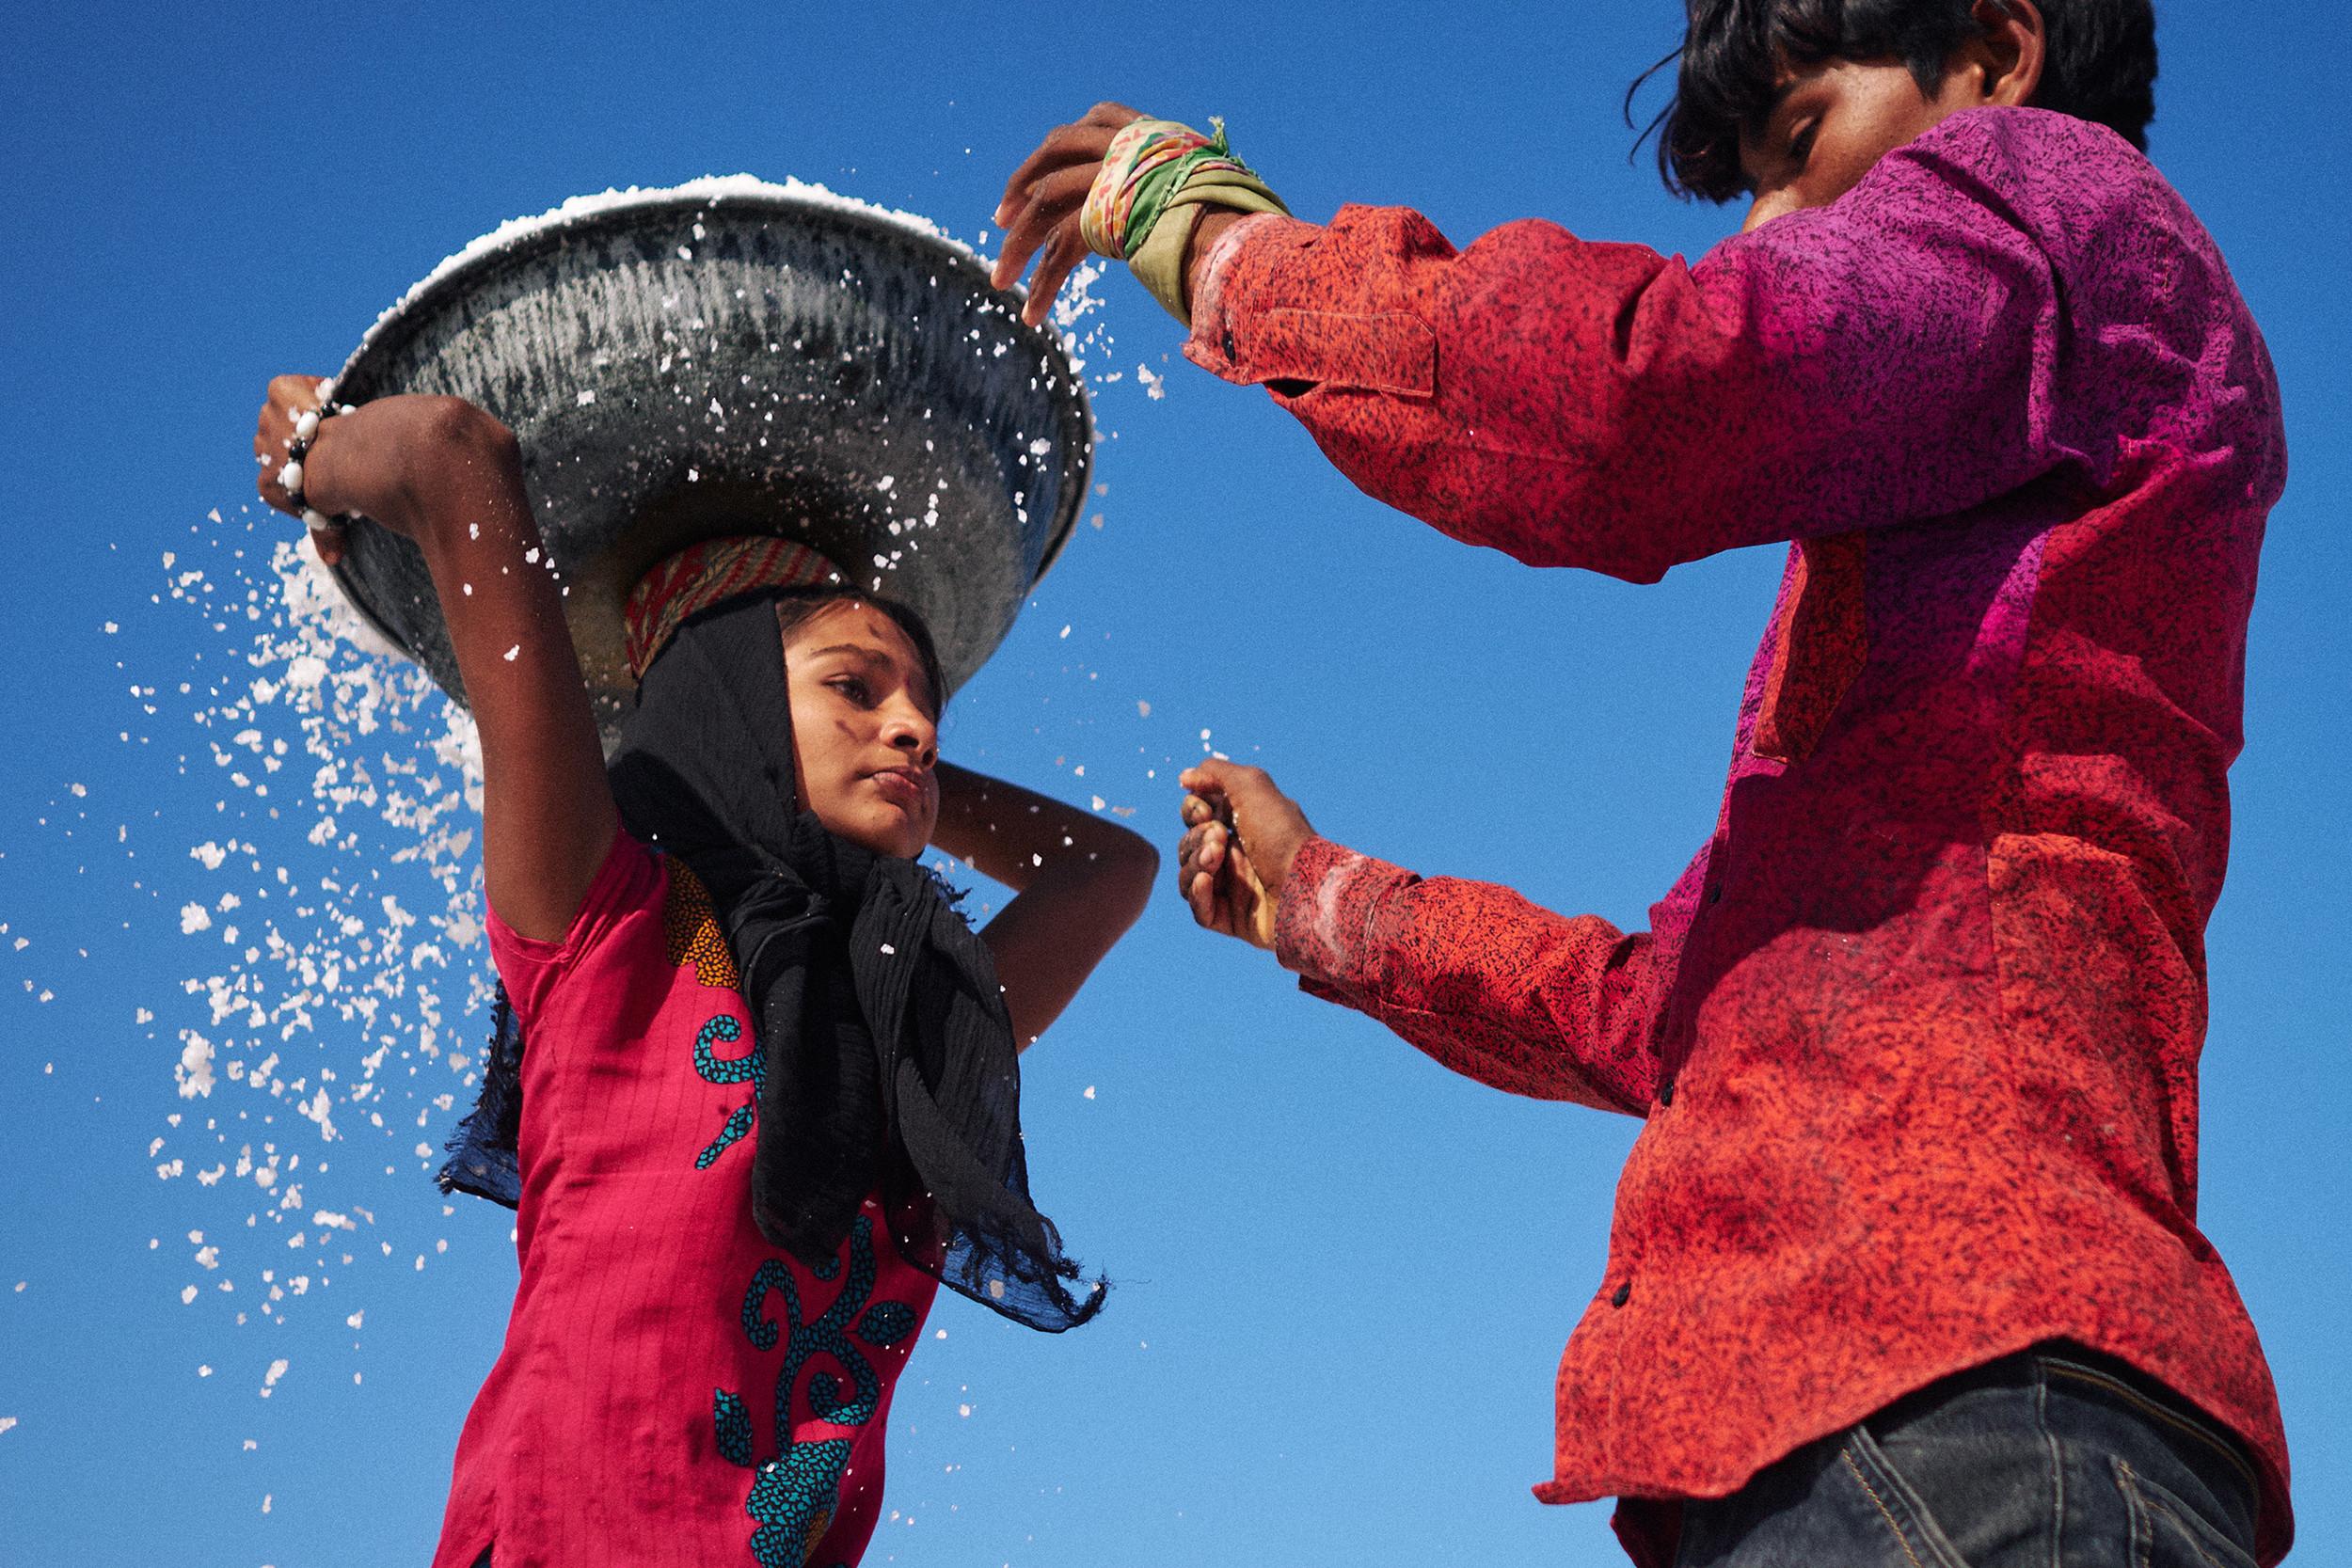 Girl salt-worker with a tub of salt on her head